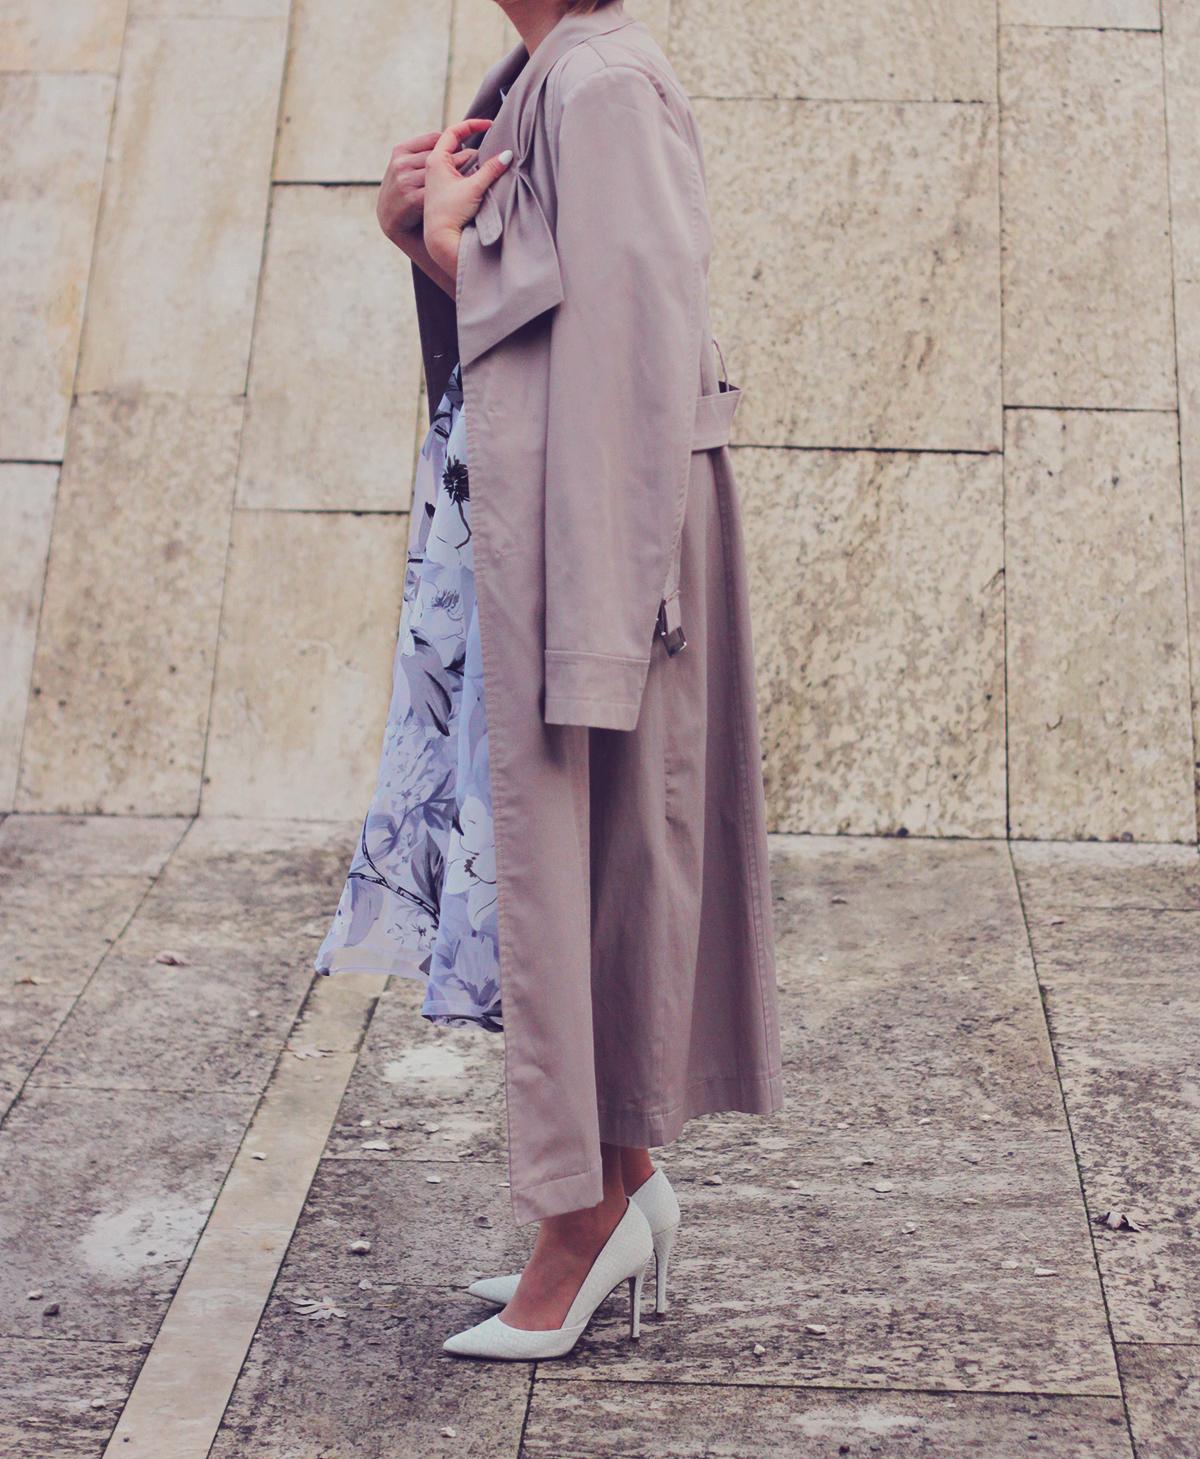 winter fashion, fashionmia sheer floral dress, long trench, white pumps